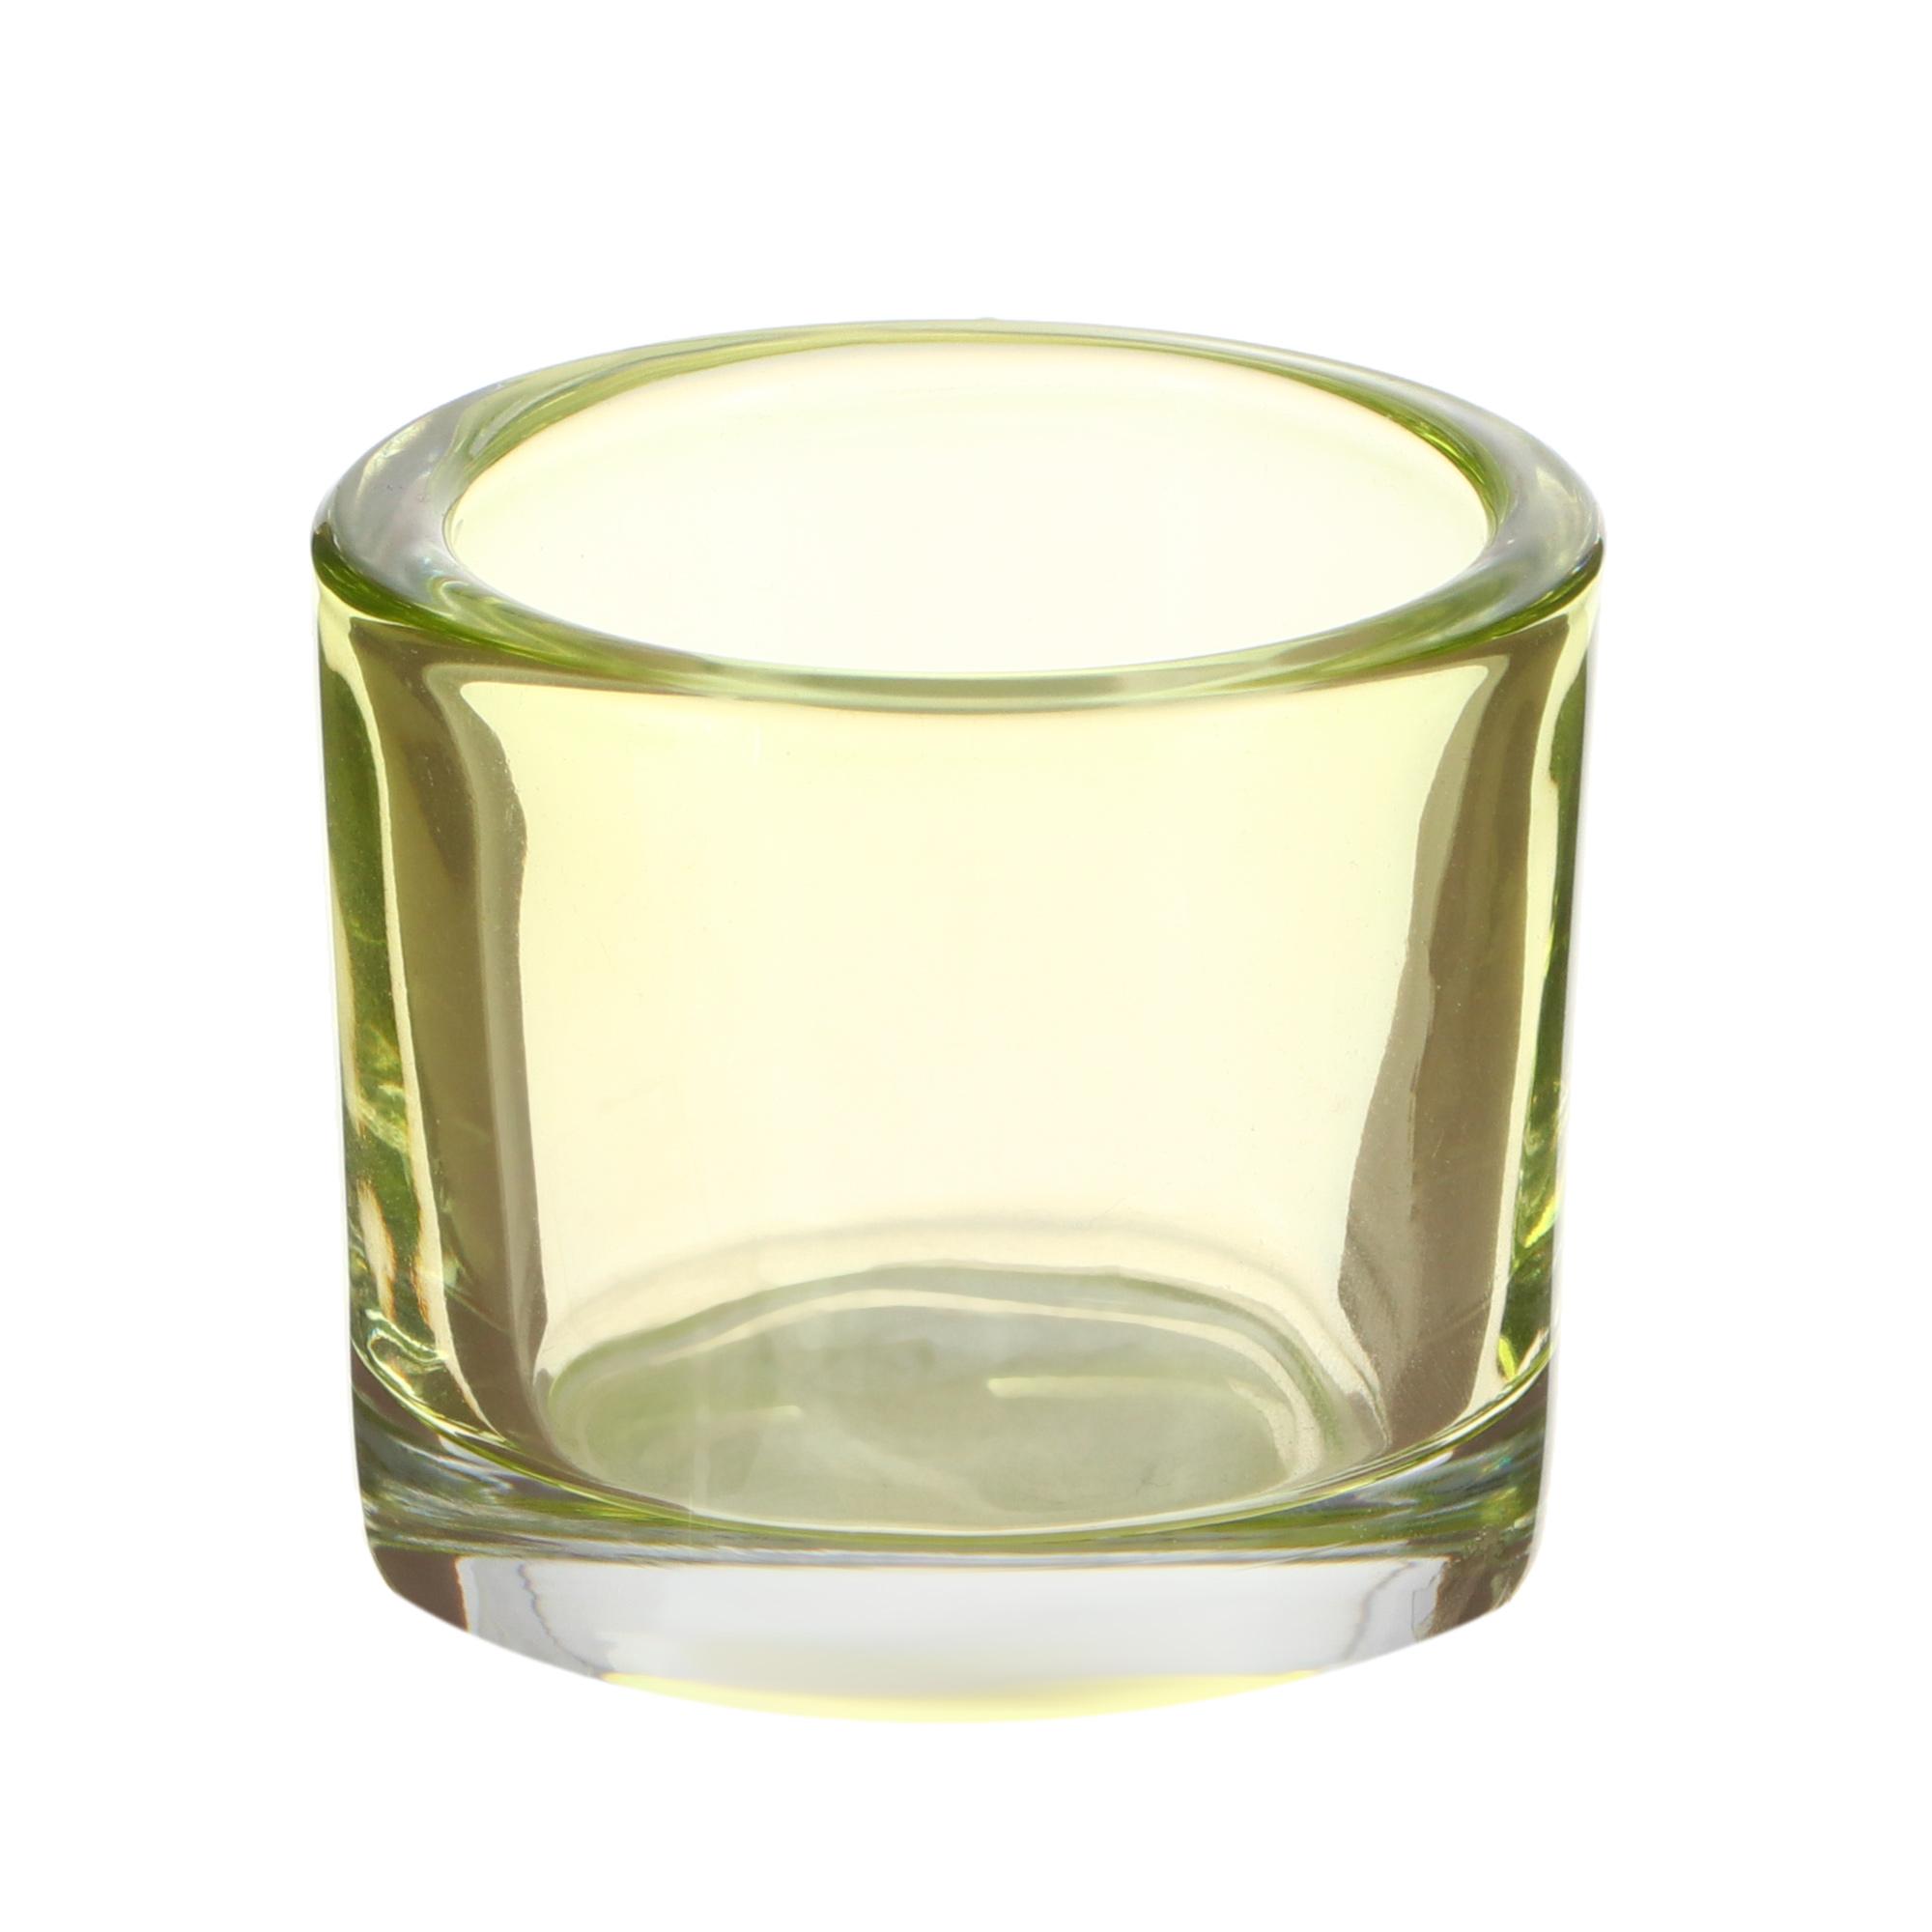 Подсвечник Kaemingk для чайной свечи 6.5х5.7 см